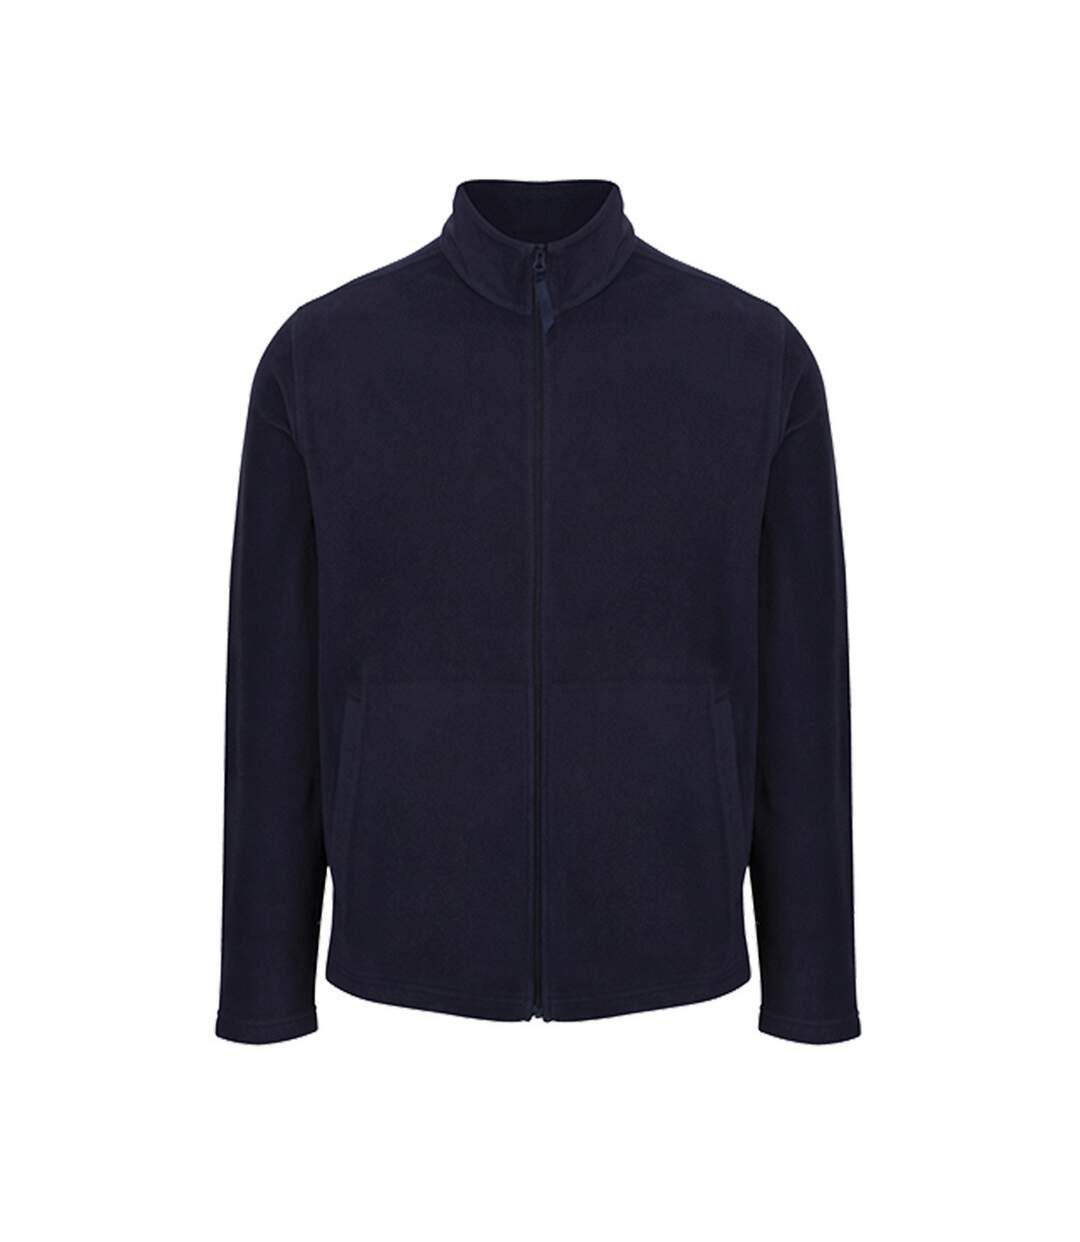 Regatta Professional Mens Classic Micro Fleece Jacket (Dark Navy) - UTPC4050